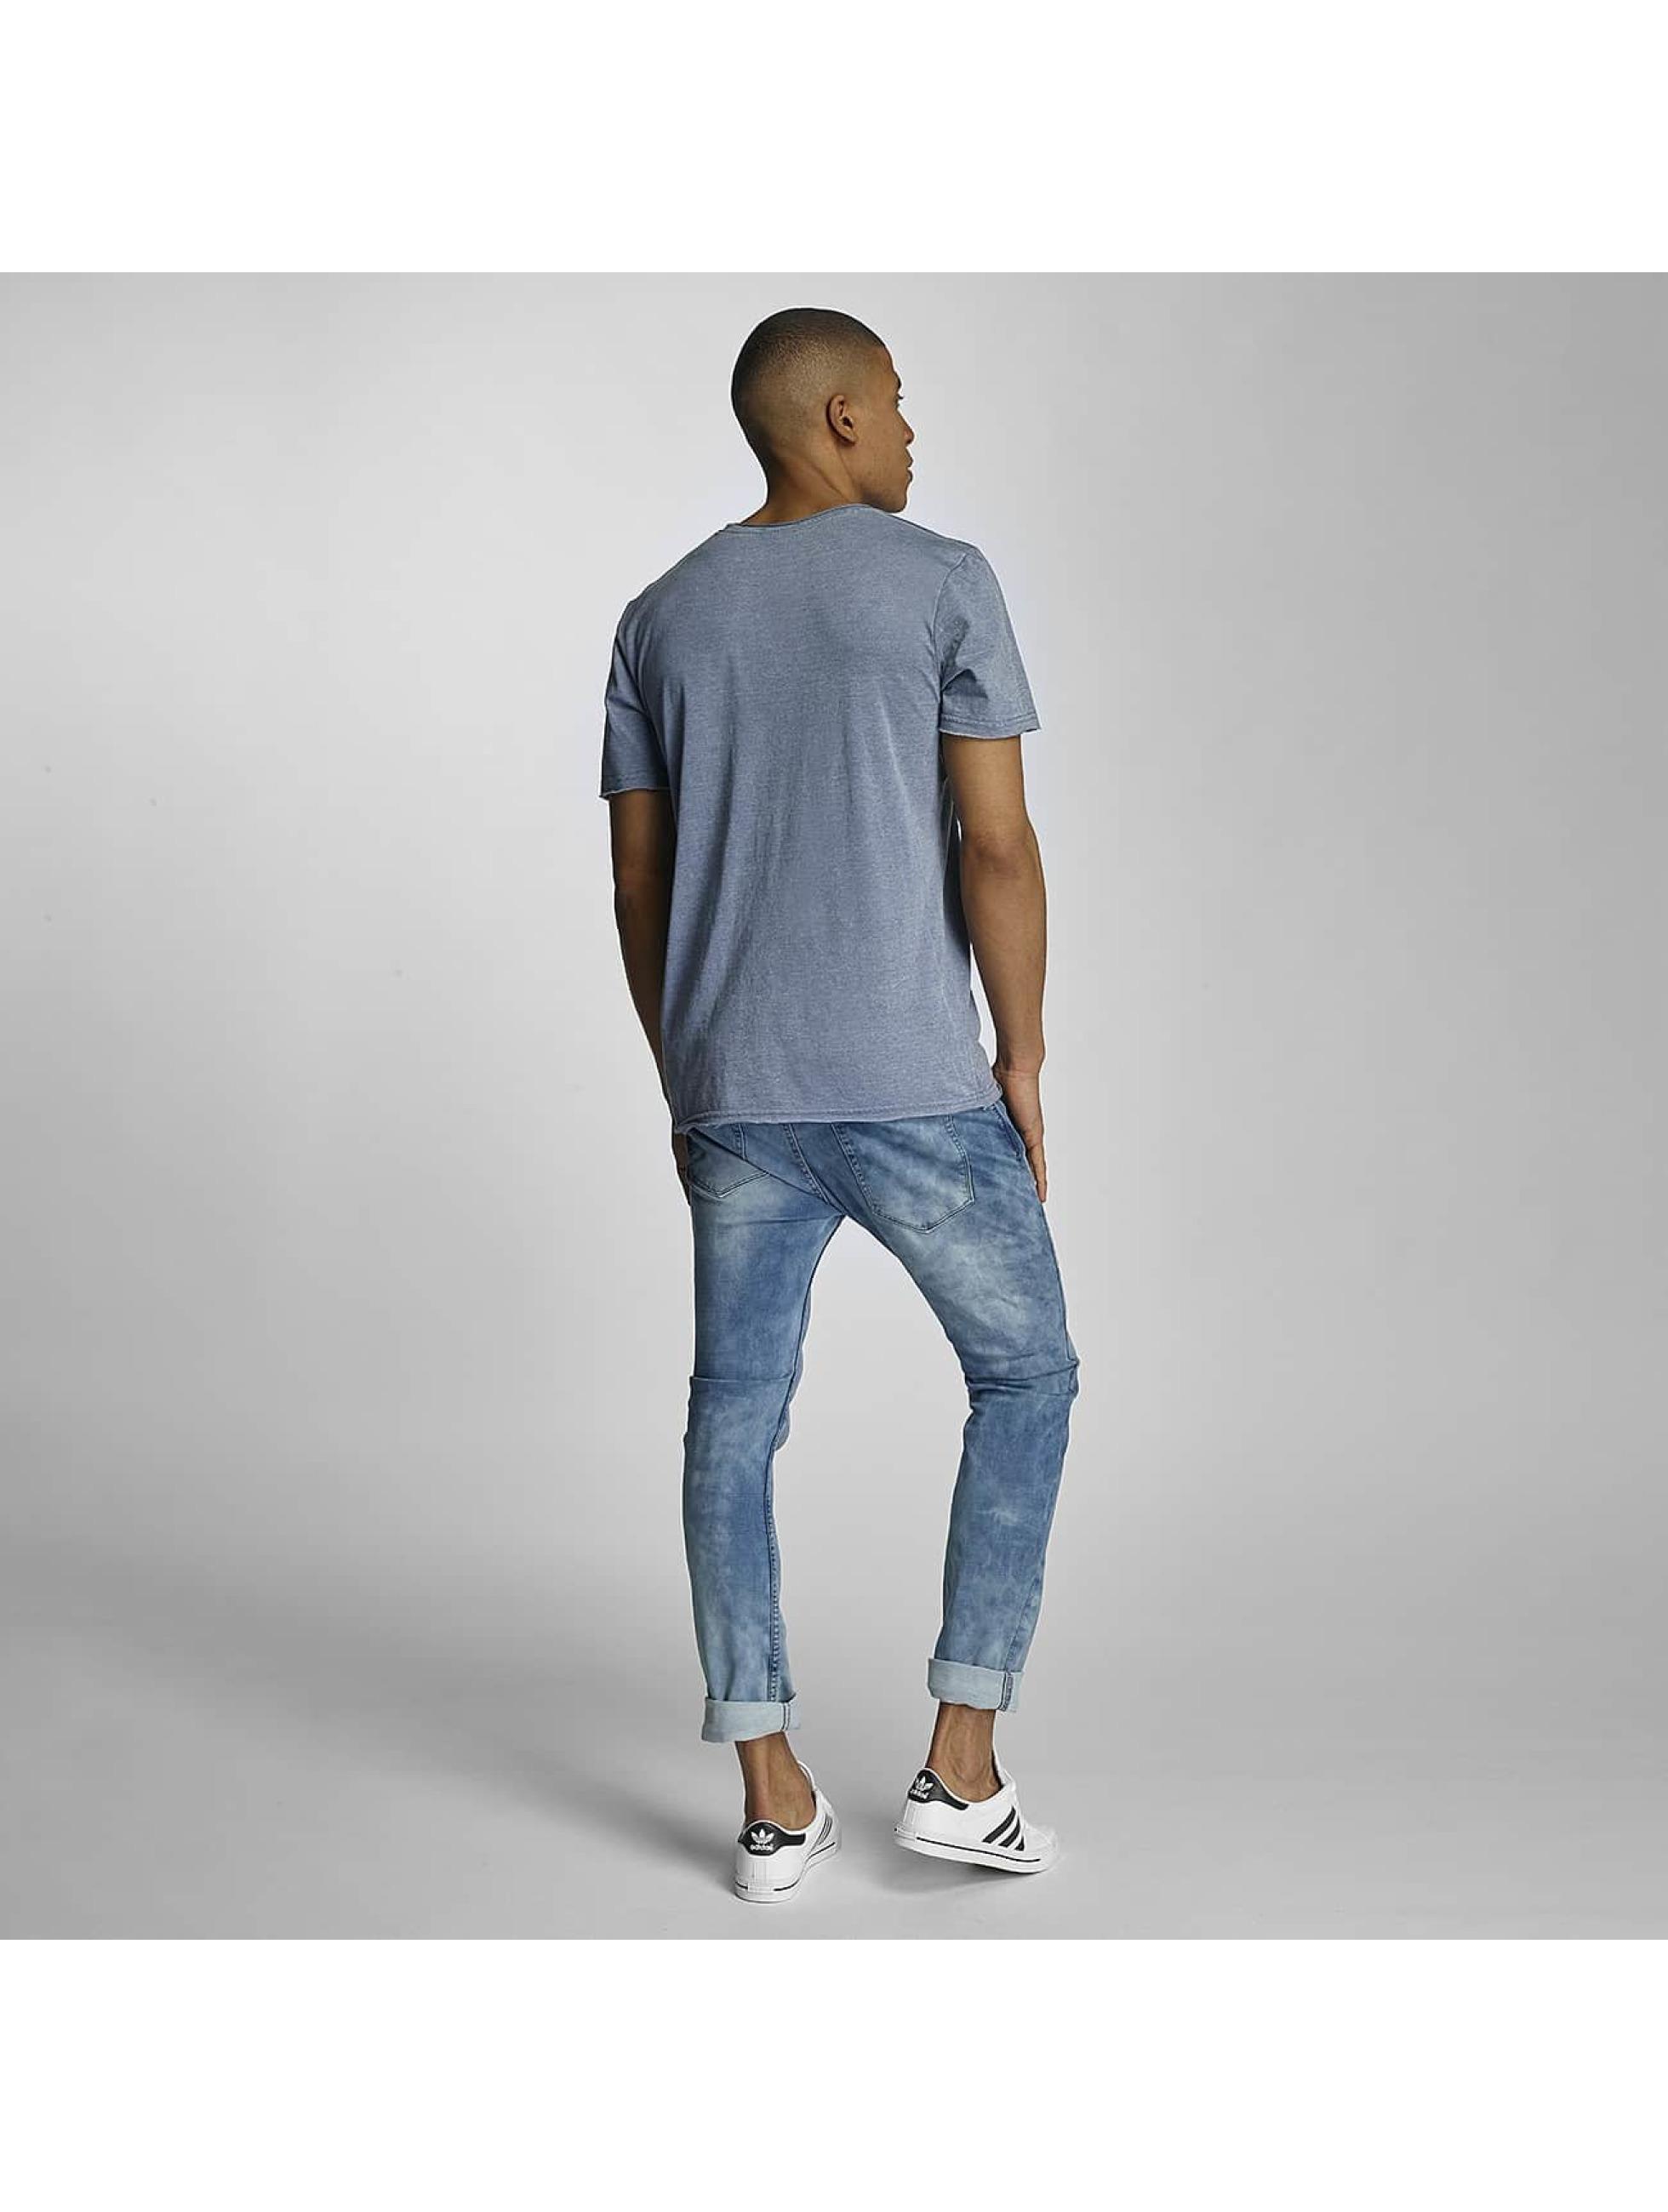 Sublevel Camiseta Live Your Life azul